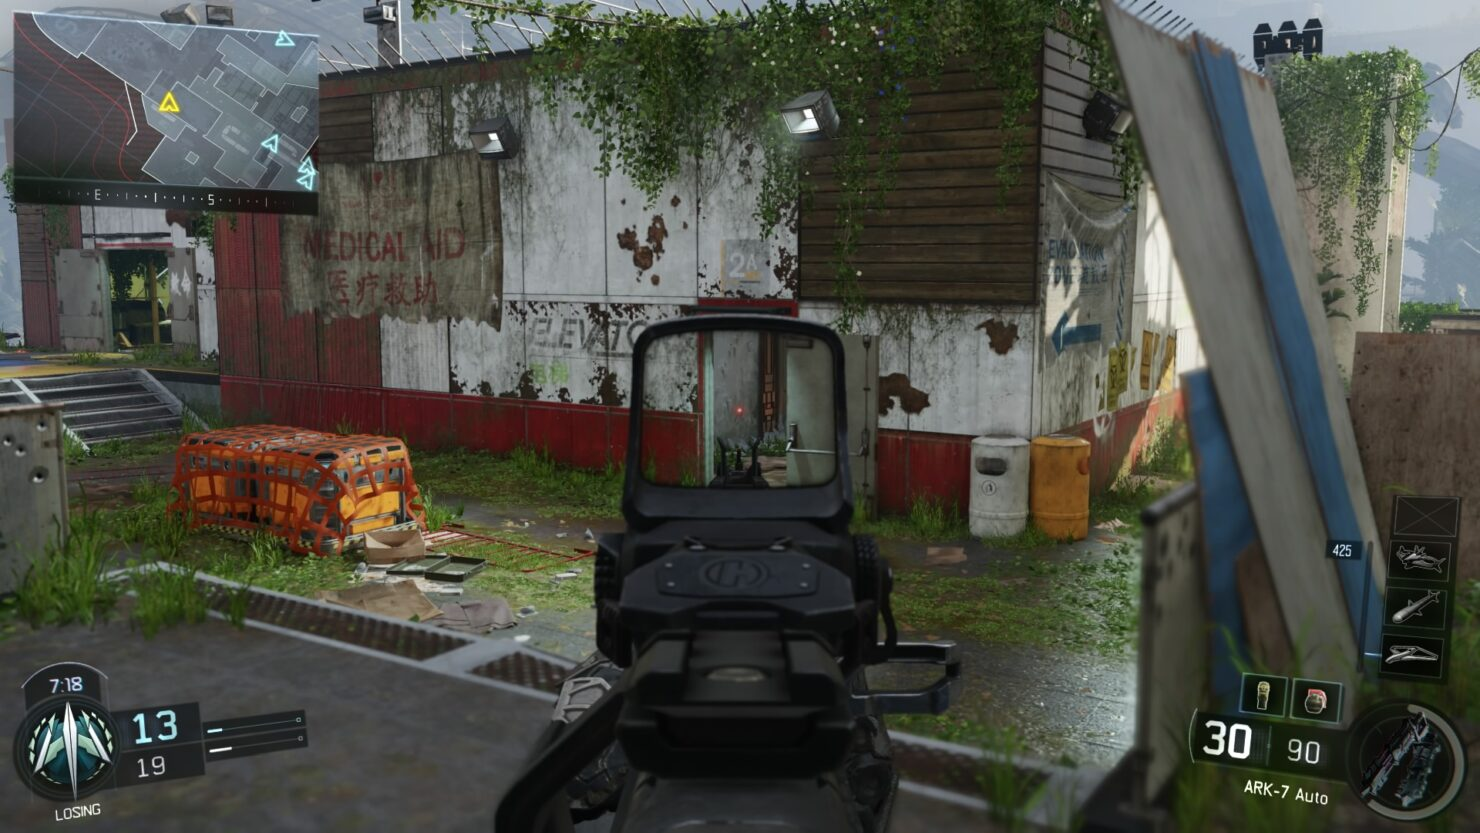 call-of-duty-black-ops-iii-multiplayer-beta_20150819033025